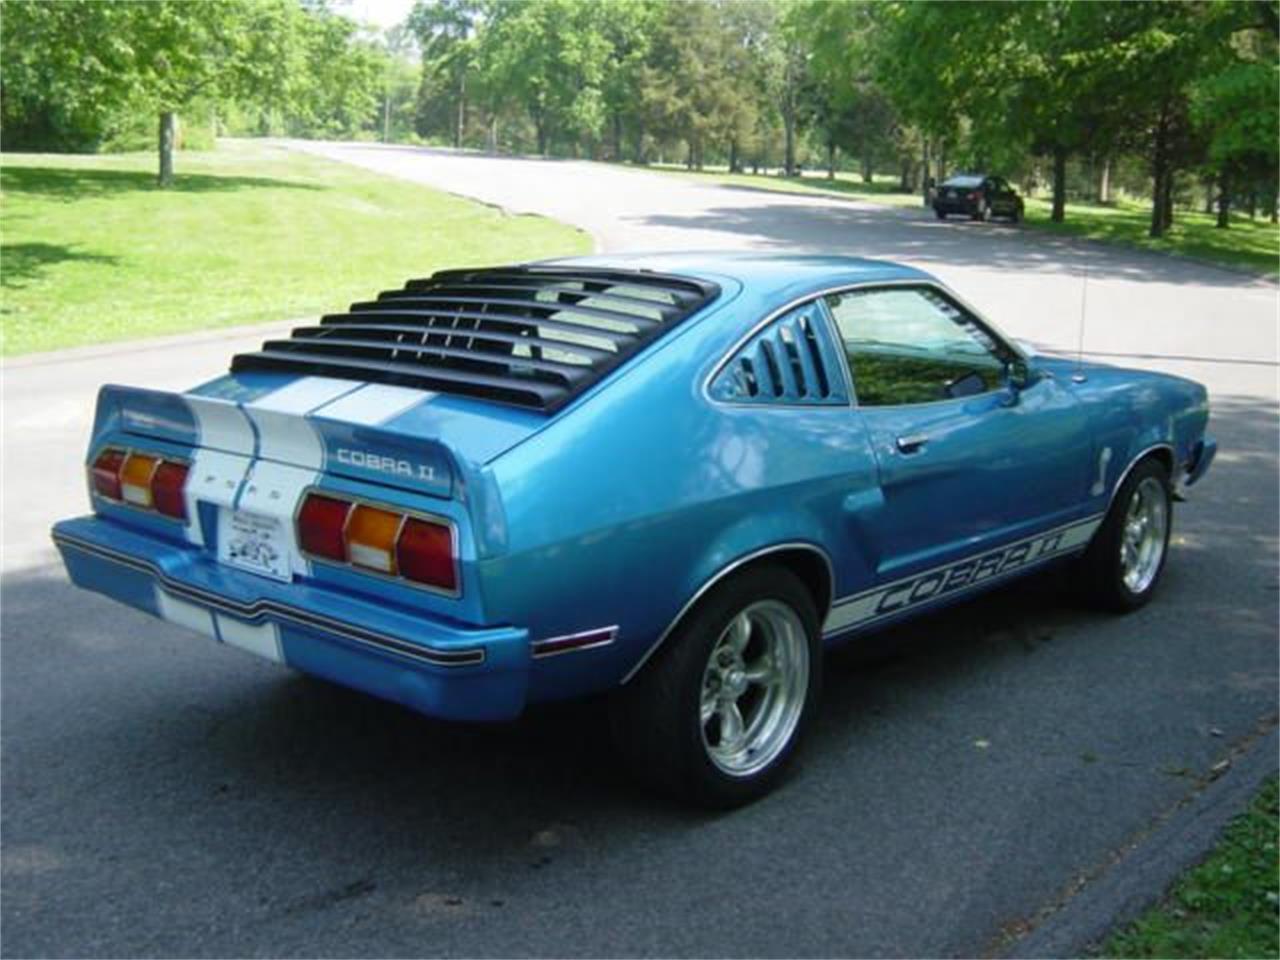 1977 Ford Mustang II Cobra for Sale | ClassicCars.com | CC-1092888